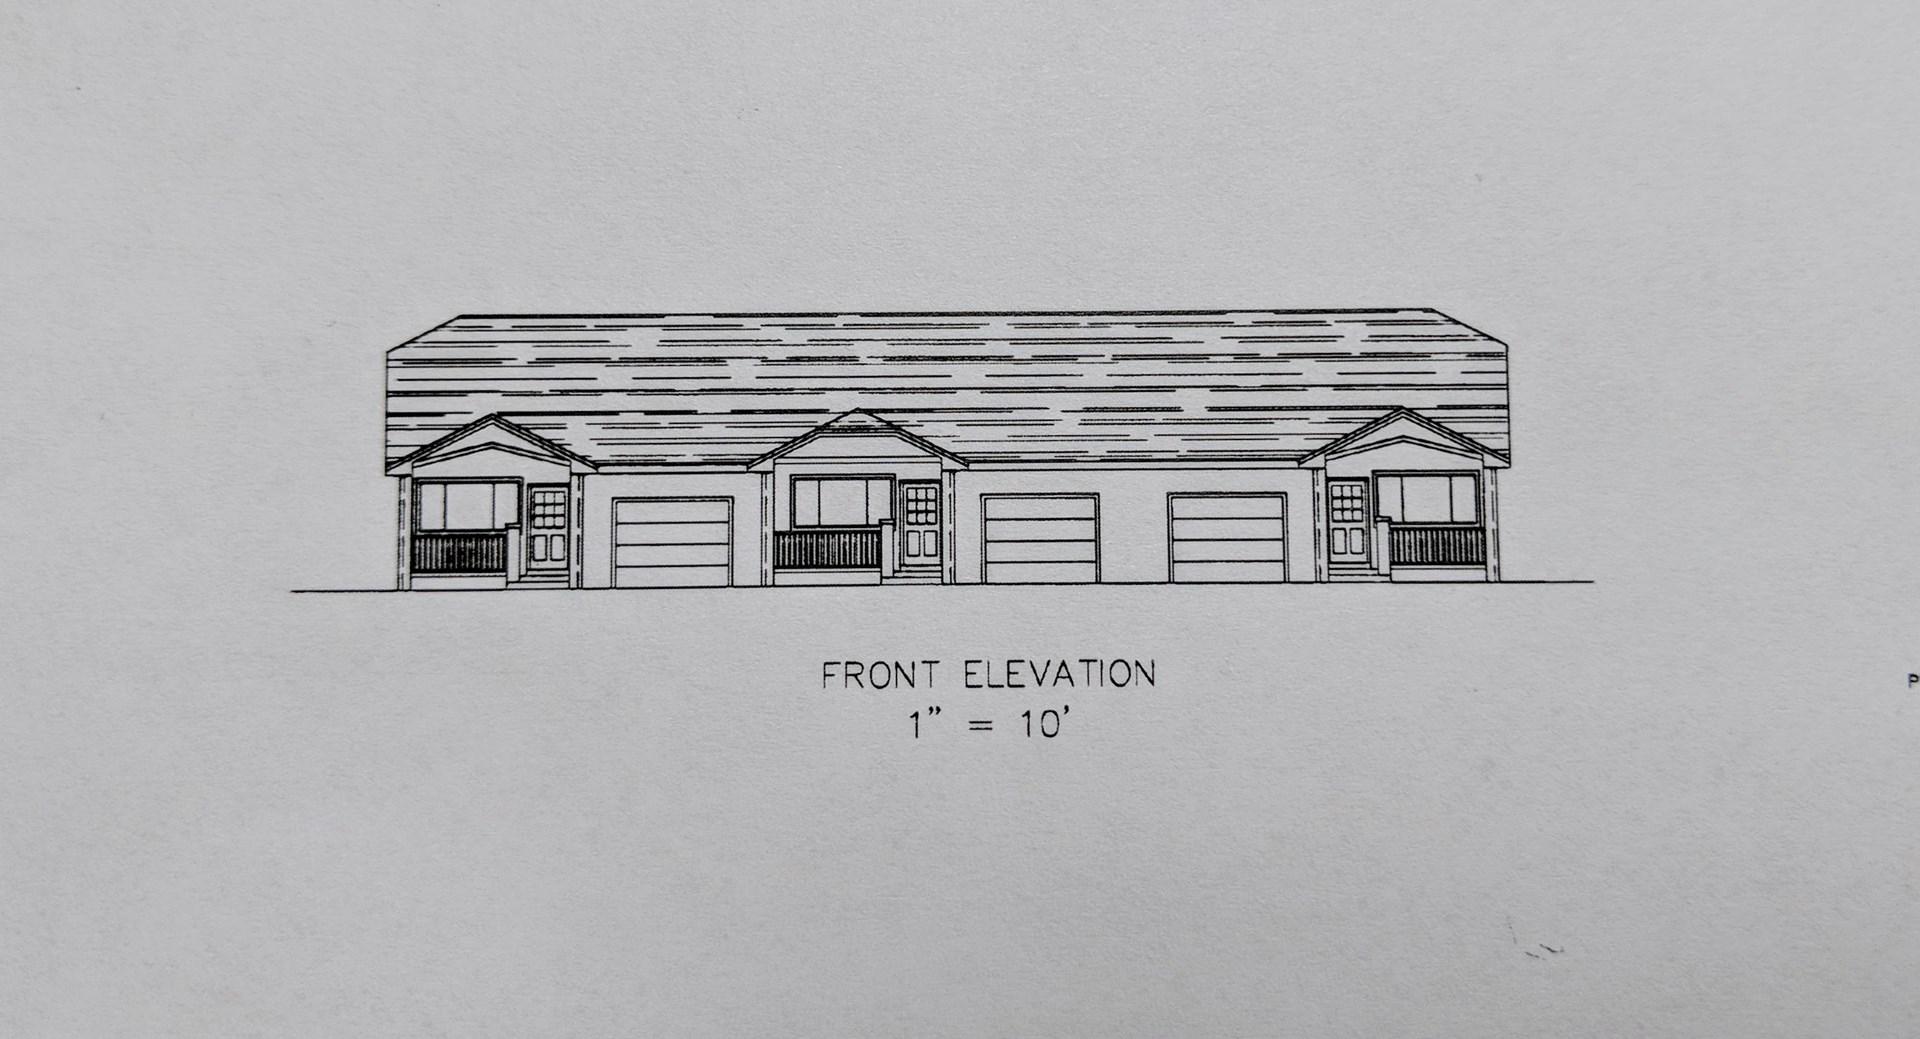 Affordable Housing Condo Unit in Buena Vista CO One Level